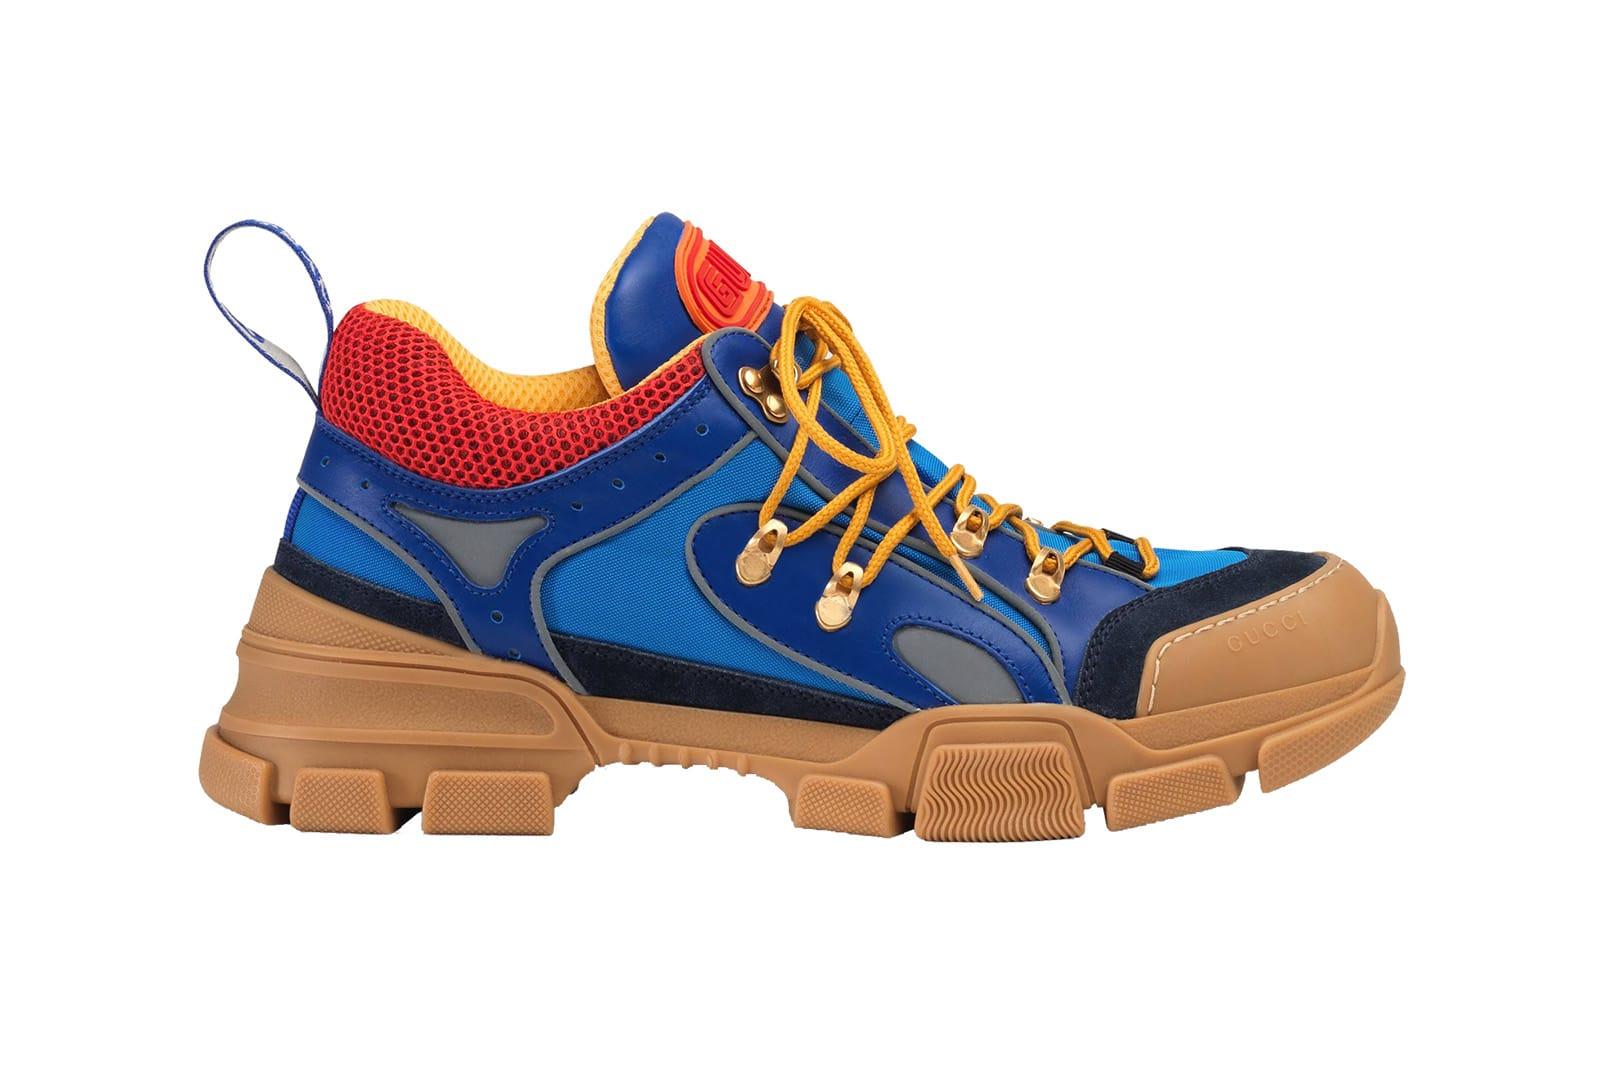 Hiking-Inspired Flashtrek Sneakers